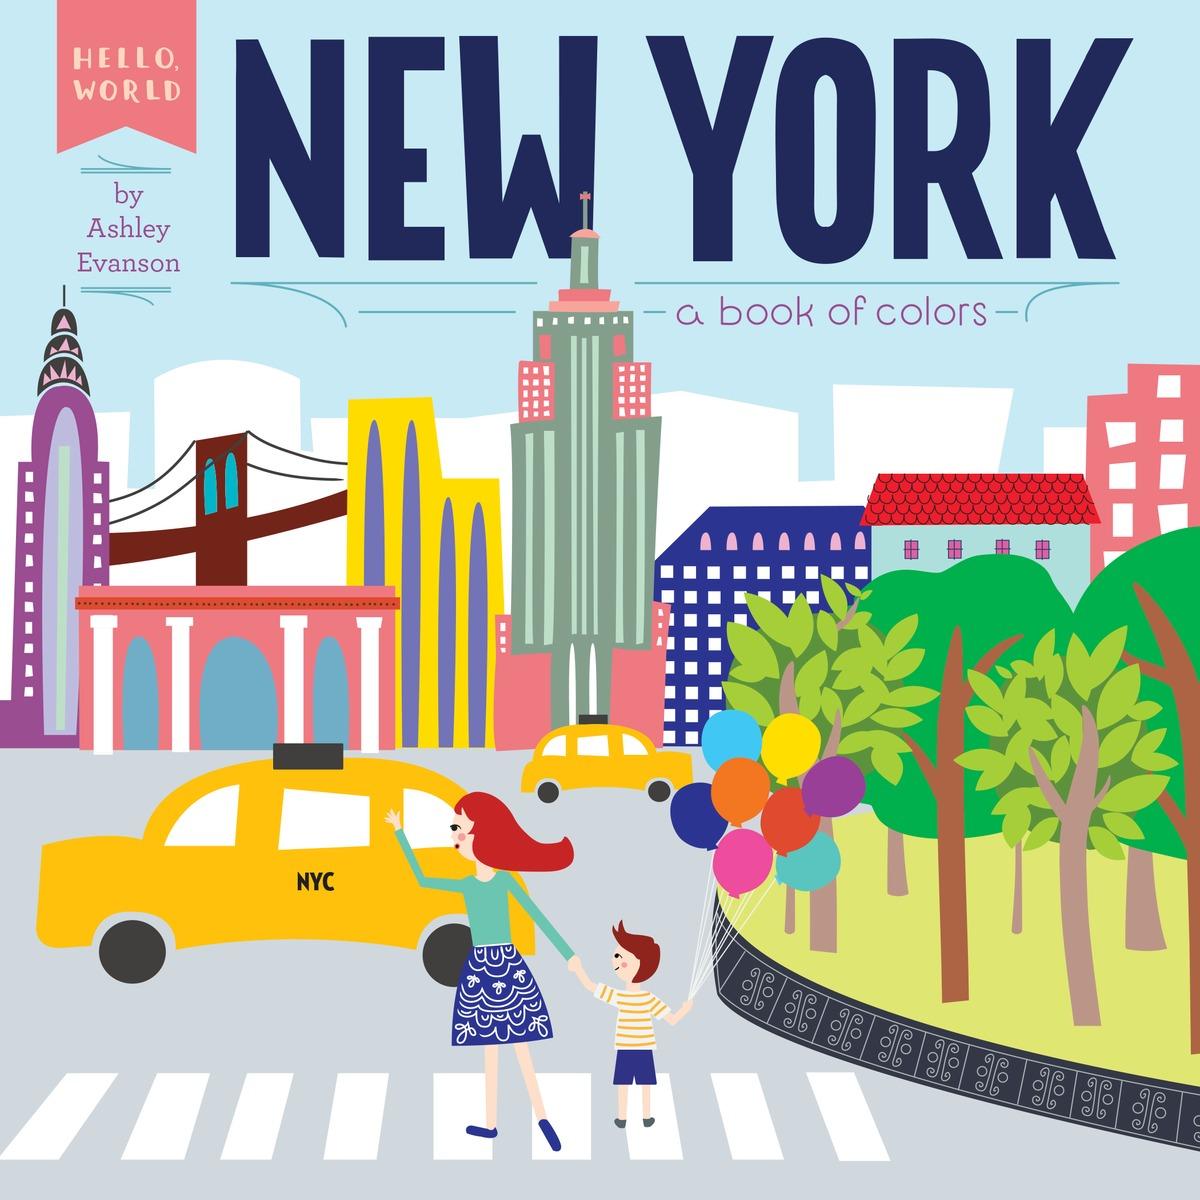 EVANSON, ASHLEY. HELLO, WORLD: NEW YORK